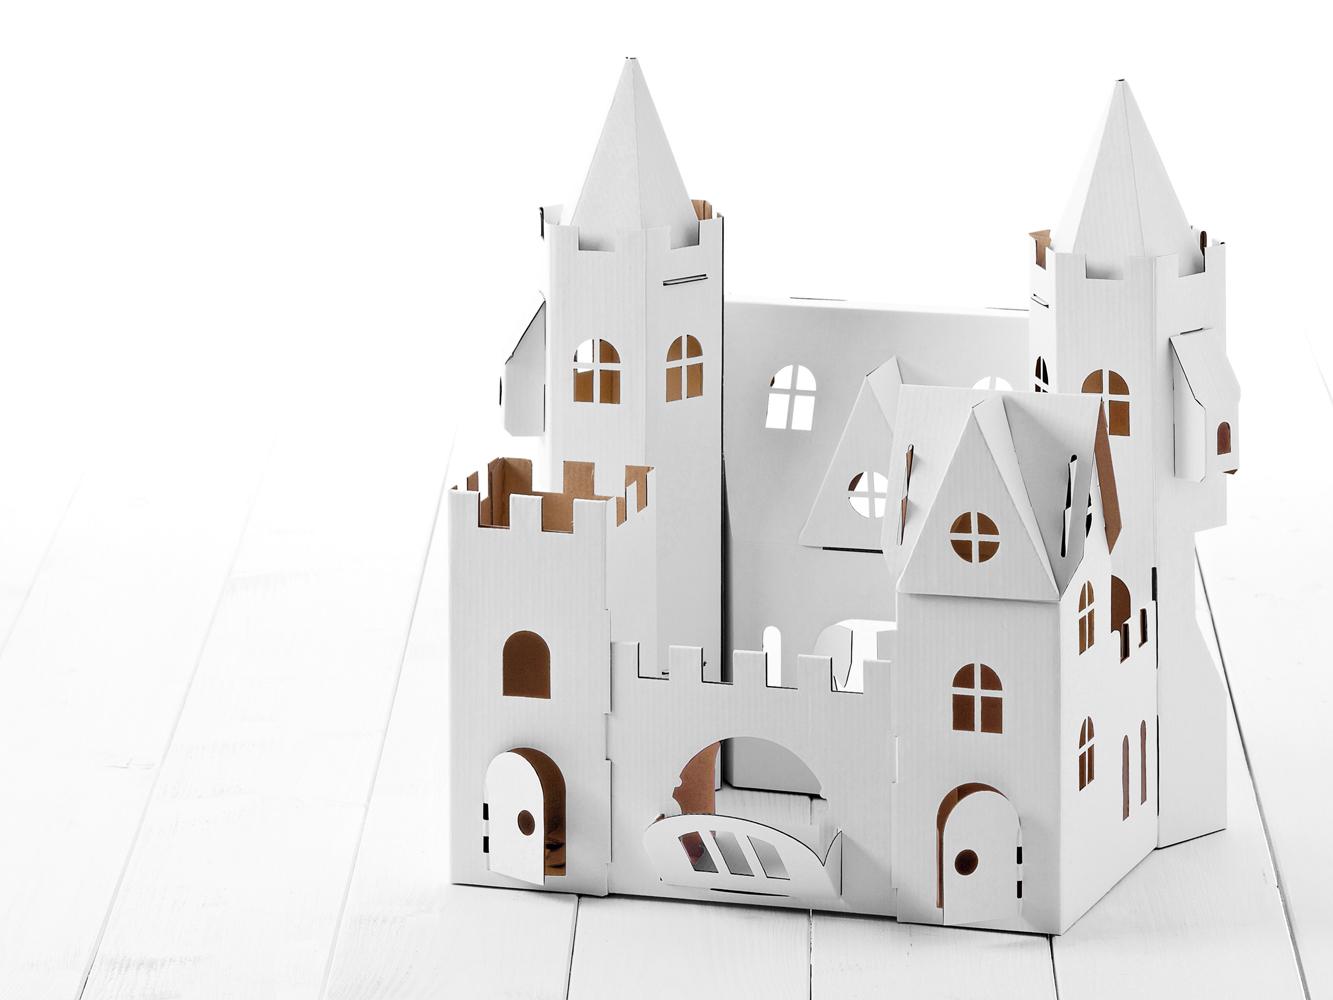 geschenktipp 9 m rchenschloss aus karton kingkalli. Black Bedroom Furniture Sets. Home Design Ideas